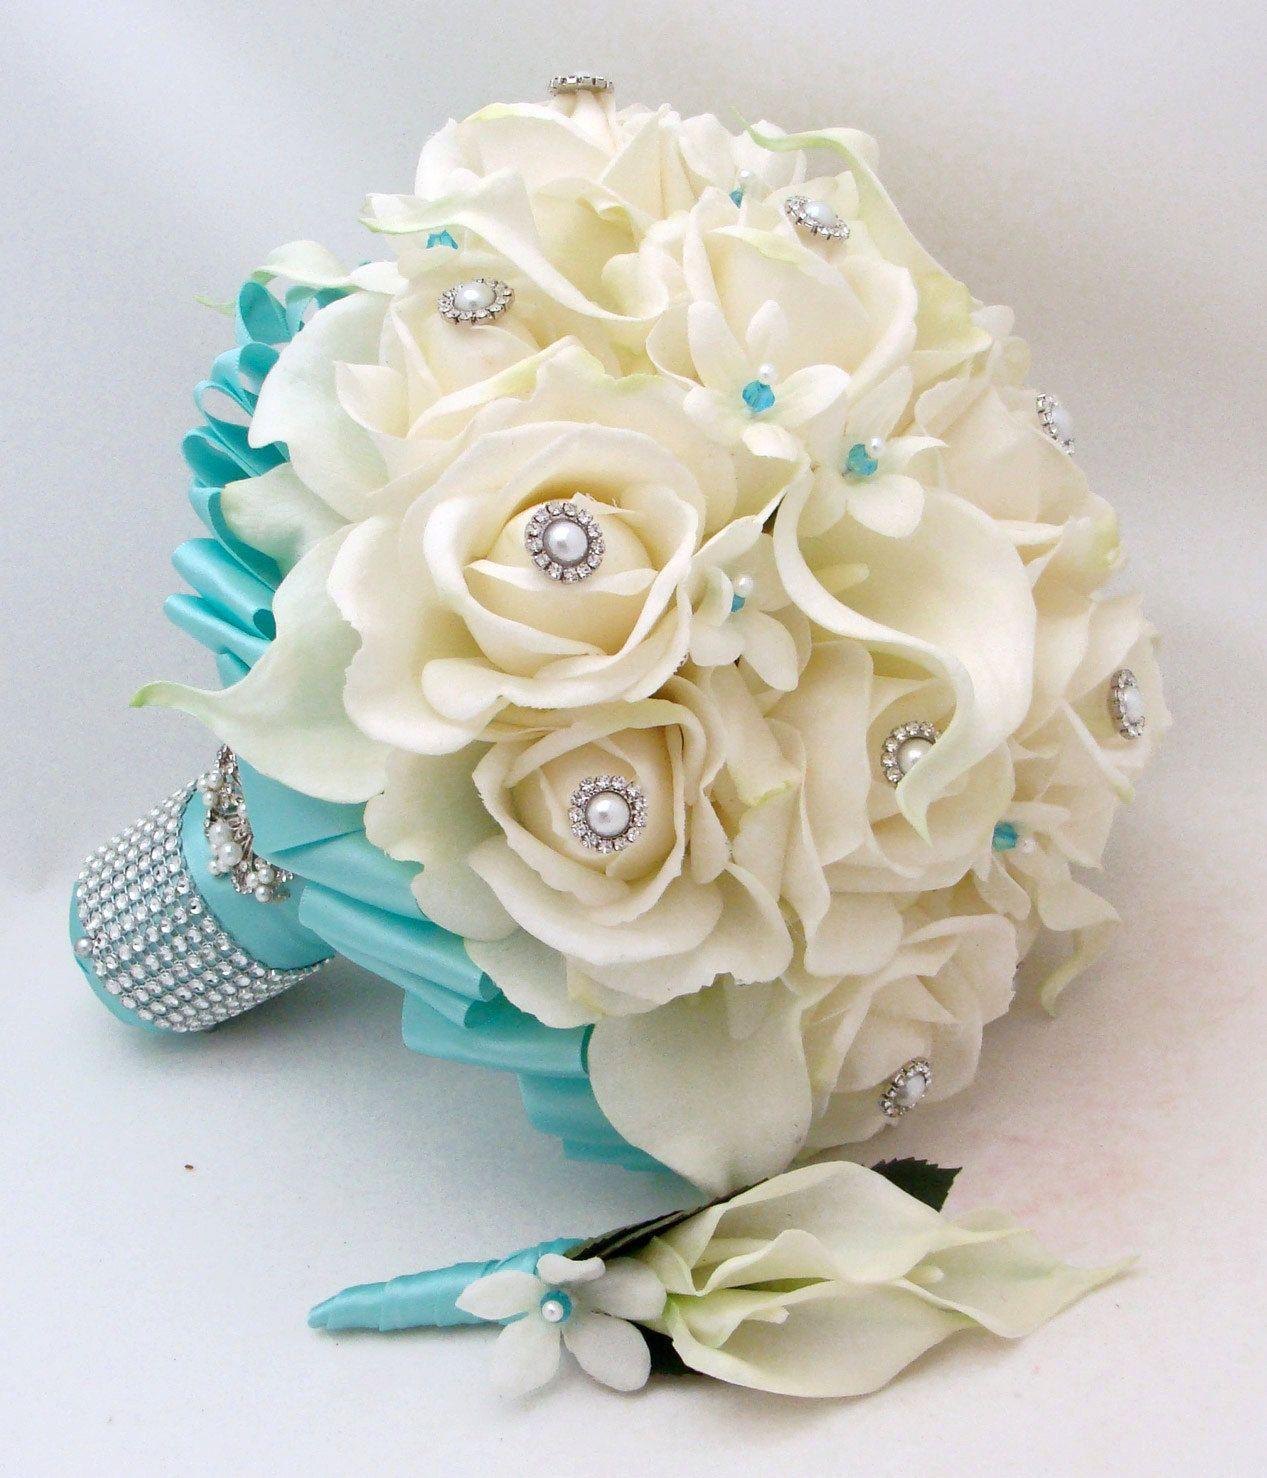 Bridal Bouquet Stephanotis Roses Calla Lily White Aqua Blue with ...